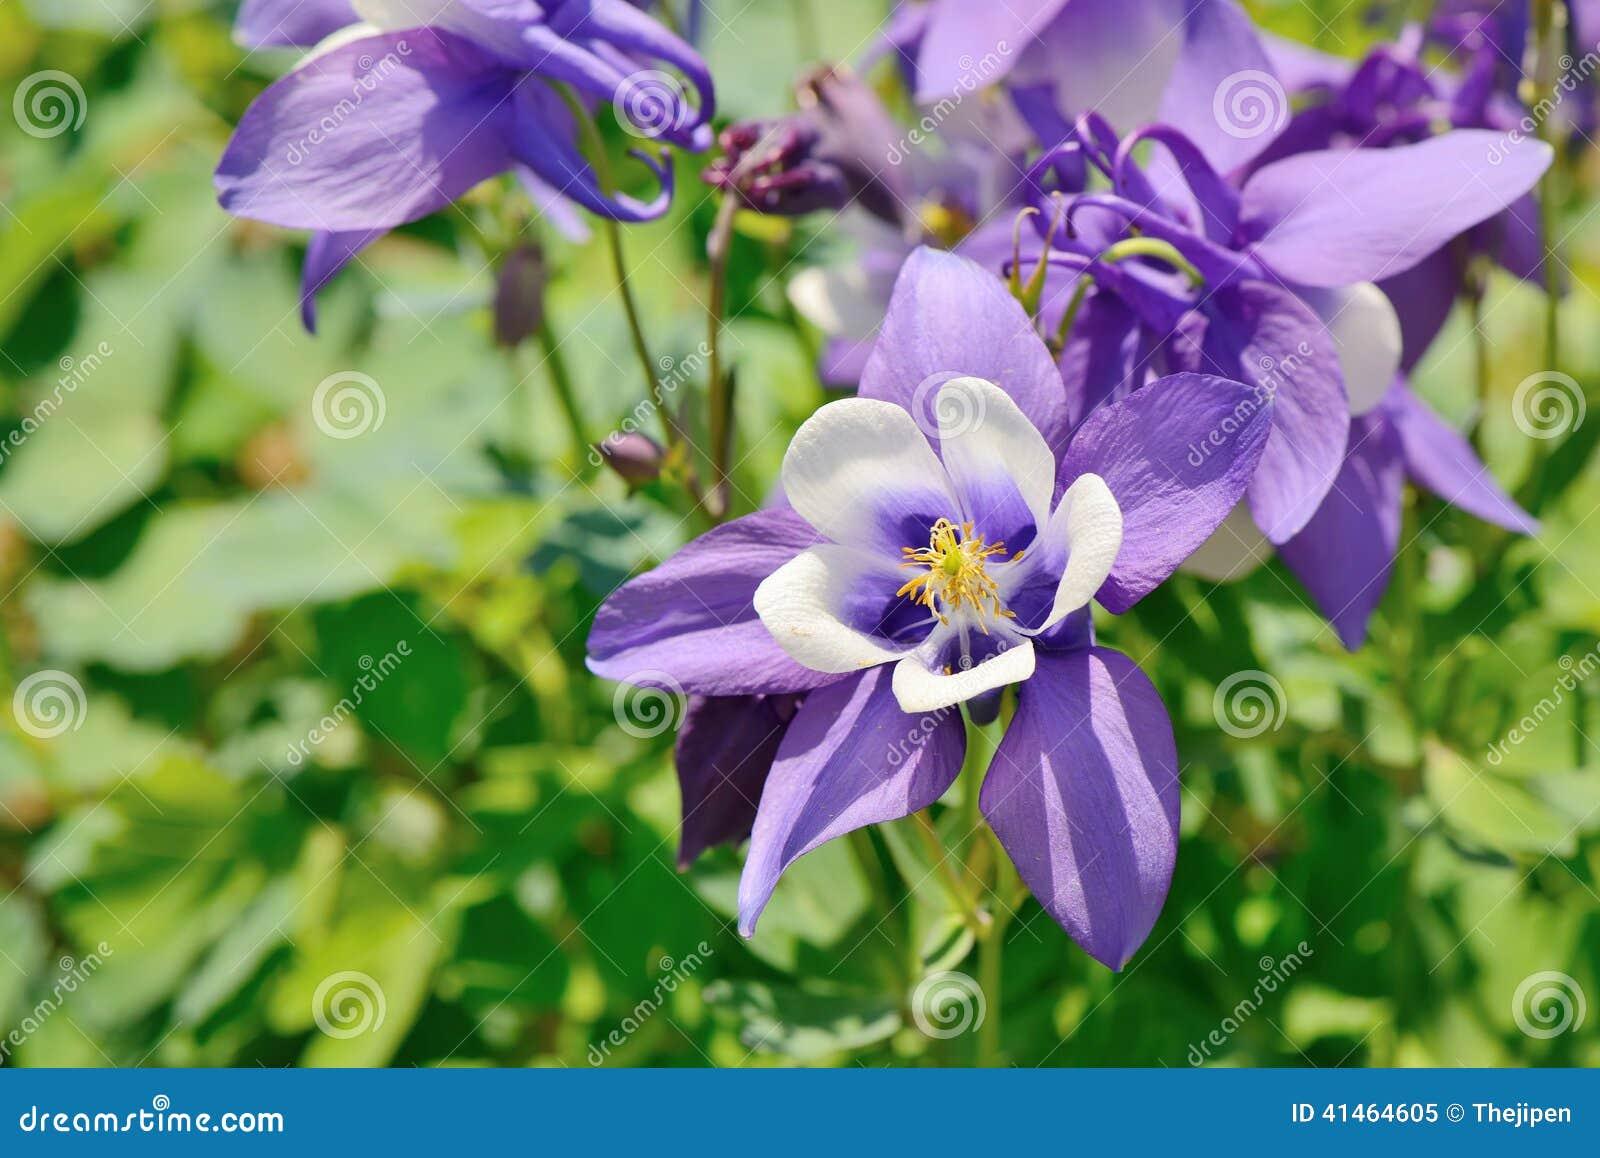 Purple columbine flowers stock photo image 41464605 closeup columbine flowers purple dhlflorist Gallery